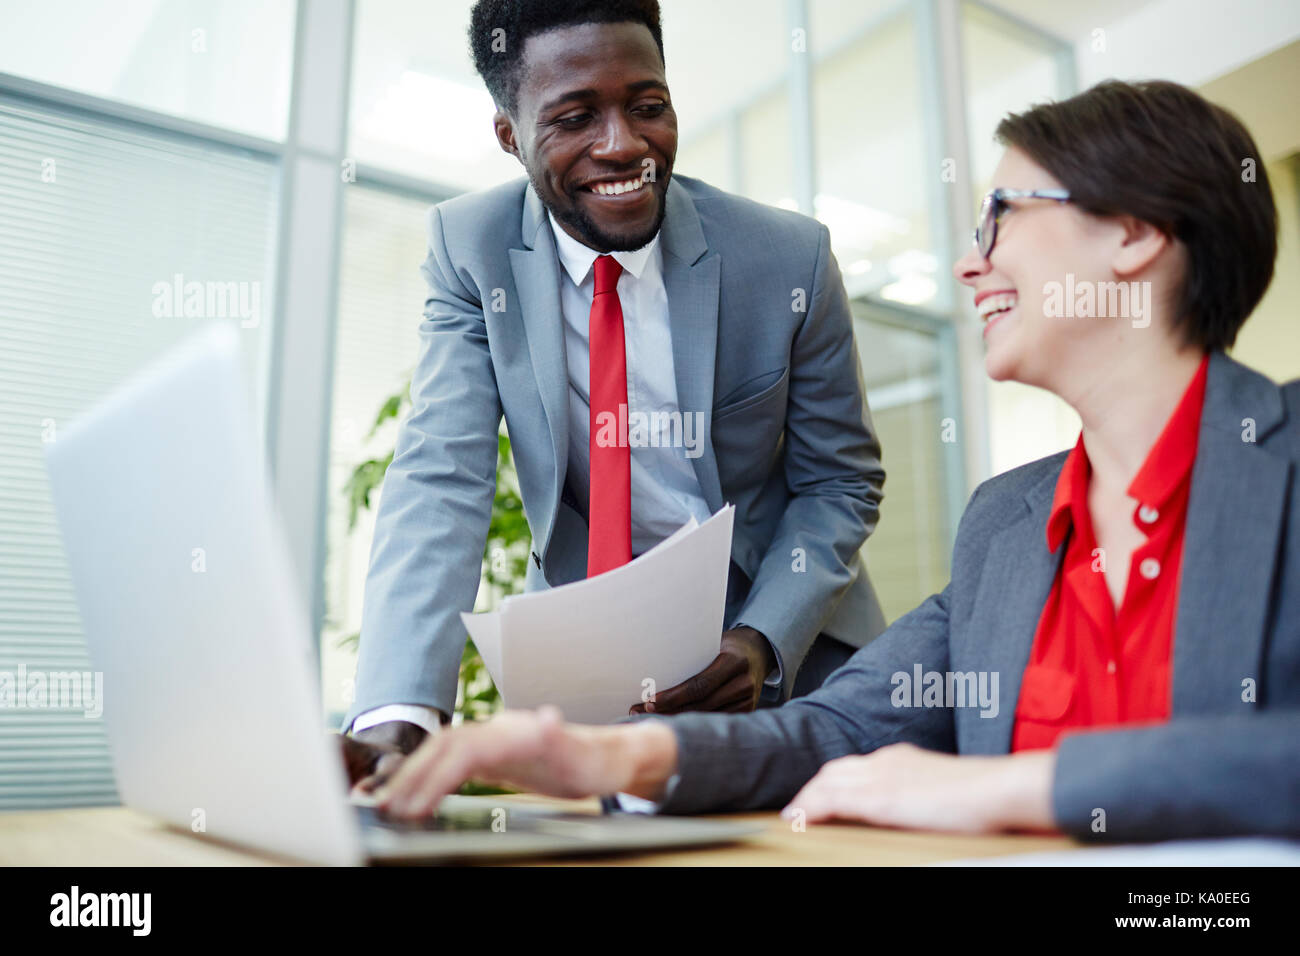 Informal Meeting at Open Plan Office - Stock Image